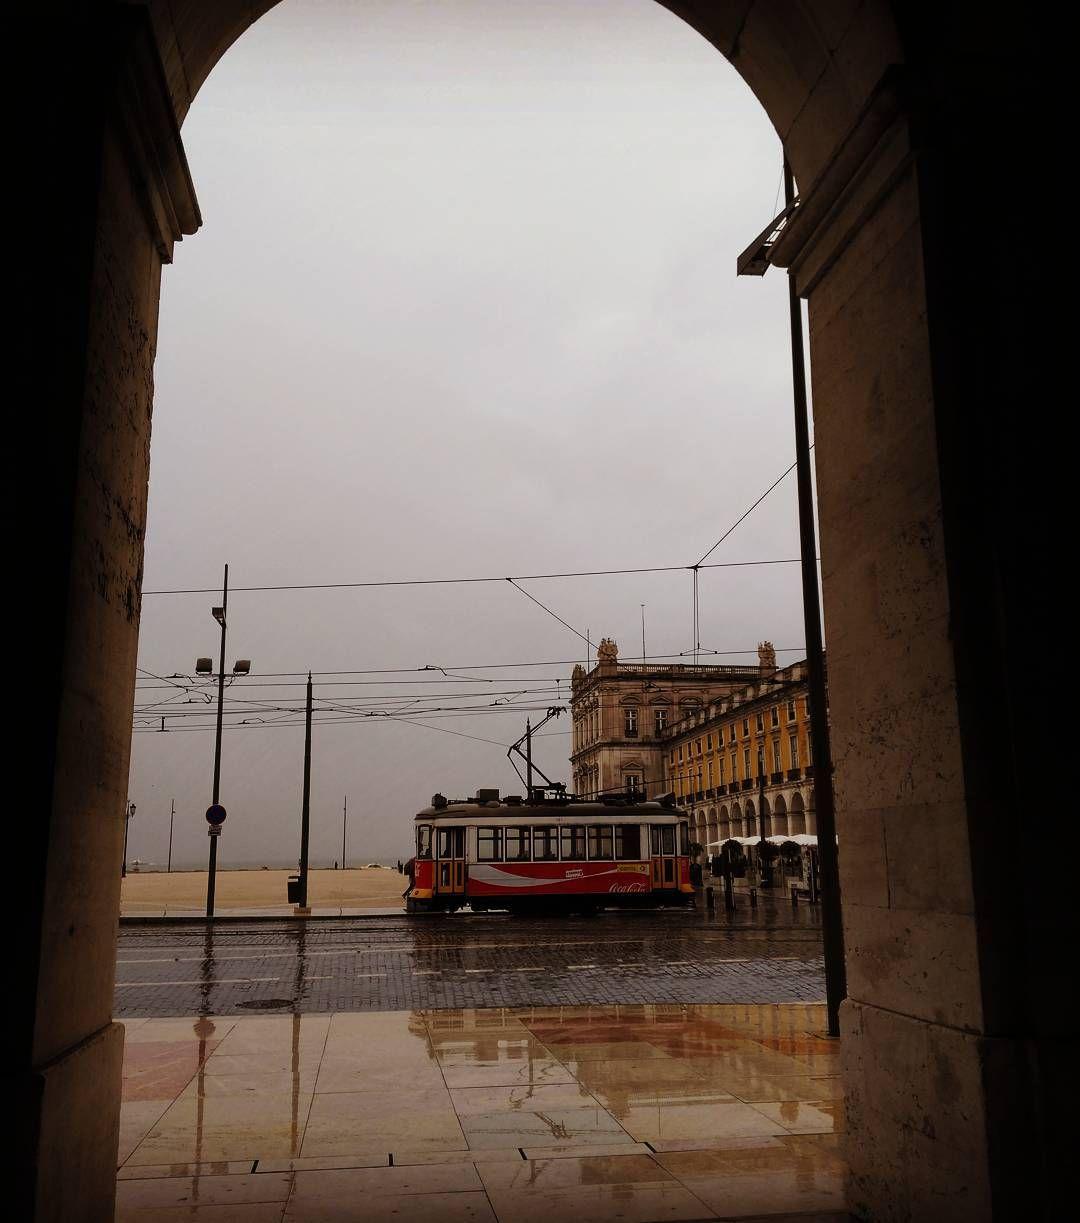 Viagens na Minha Terra #portugal #lisbon #lisboa #lisboalive #lisbonlovers #igerslisboa #lisboapt #igersportugal #portugalcomefeitos #portugaldenorteasul #ig_portugal #streetphoto_bw #bnw_captures #super_portugal #moinhodomquixote #blackandwhitephotography #p3top #instagram #wu_portugal #urbanromantix #brasileiraemportugal #streetphotography #portugalnumdia #igers #fototiradapormim #colares #vsco #conhecendoportugal #portugalalive #instapic